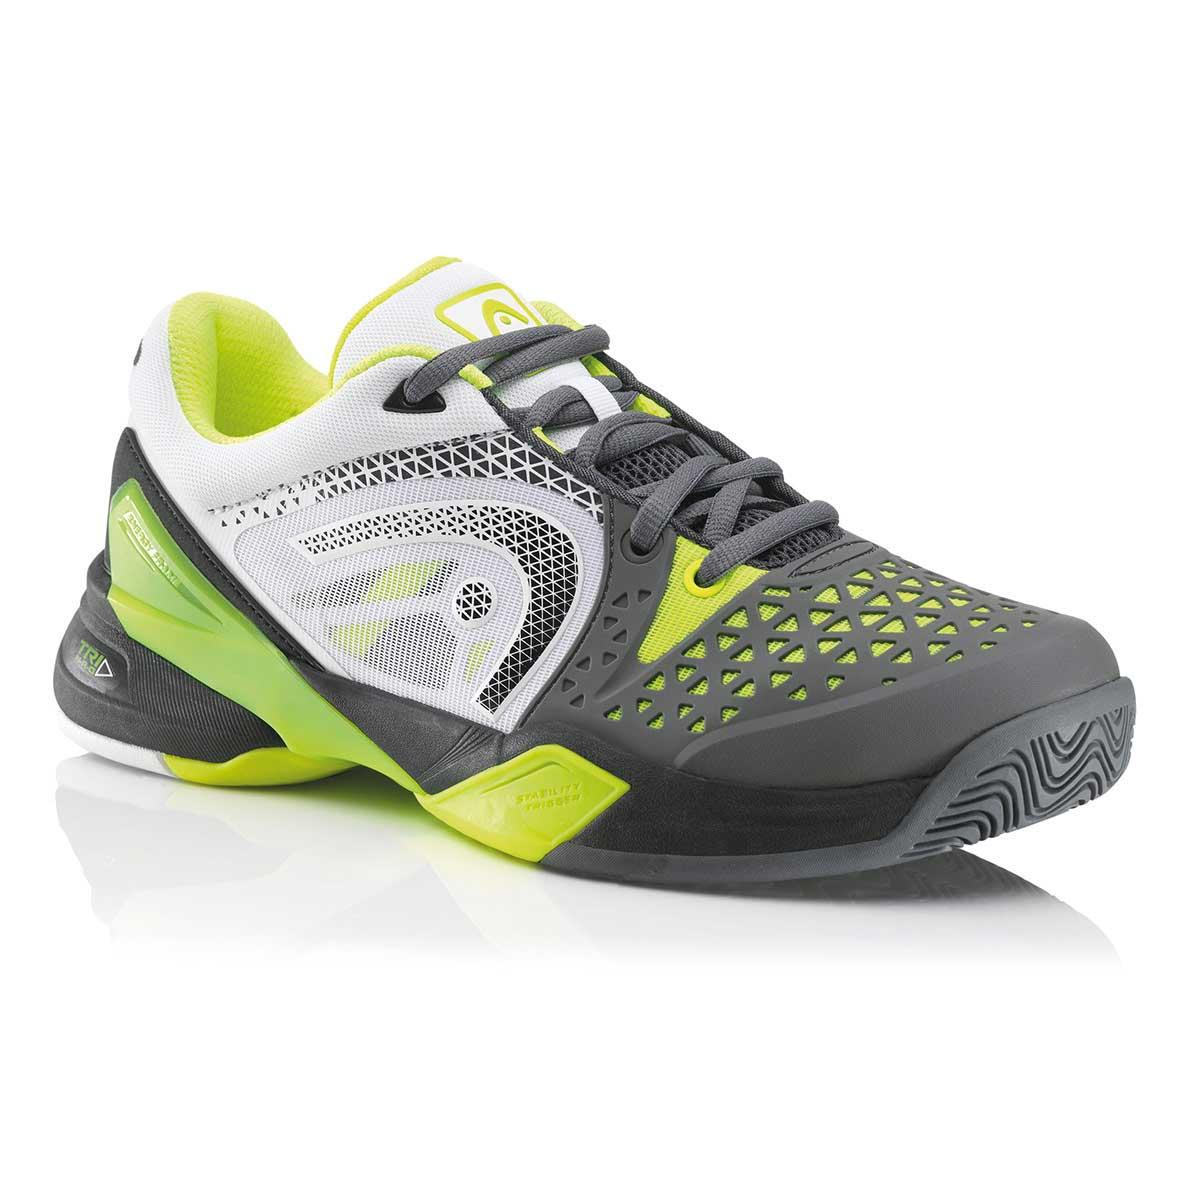 Buy Head Revolt Pro Tennis Shoes (Green Neon Yellow) Online India bc6a046d9952